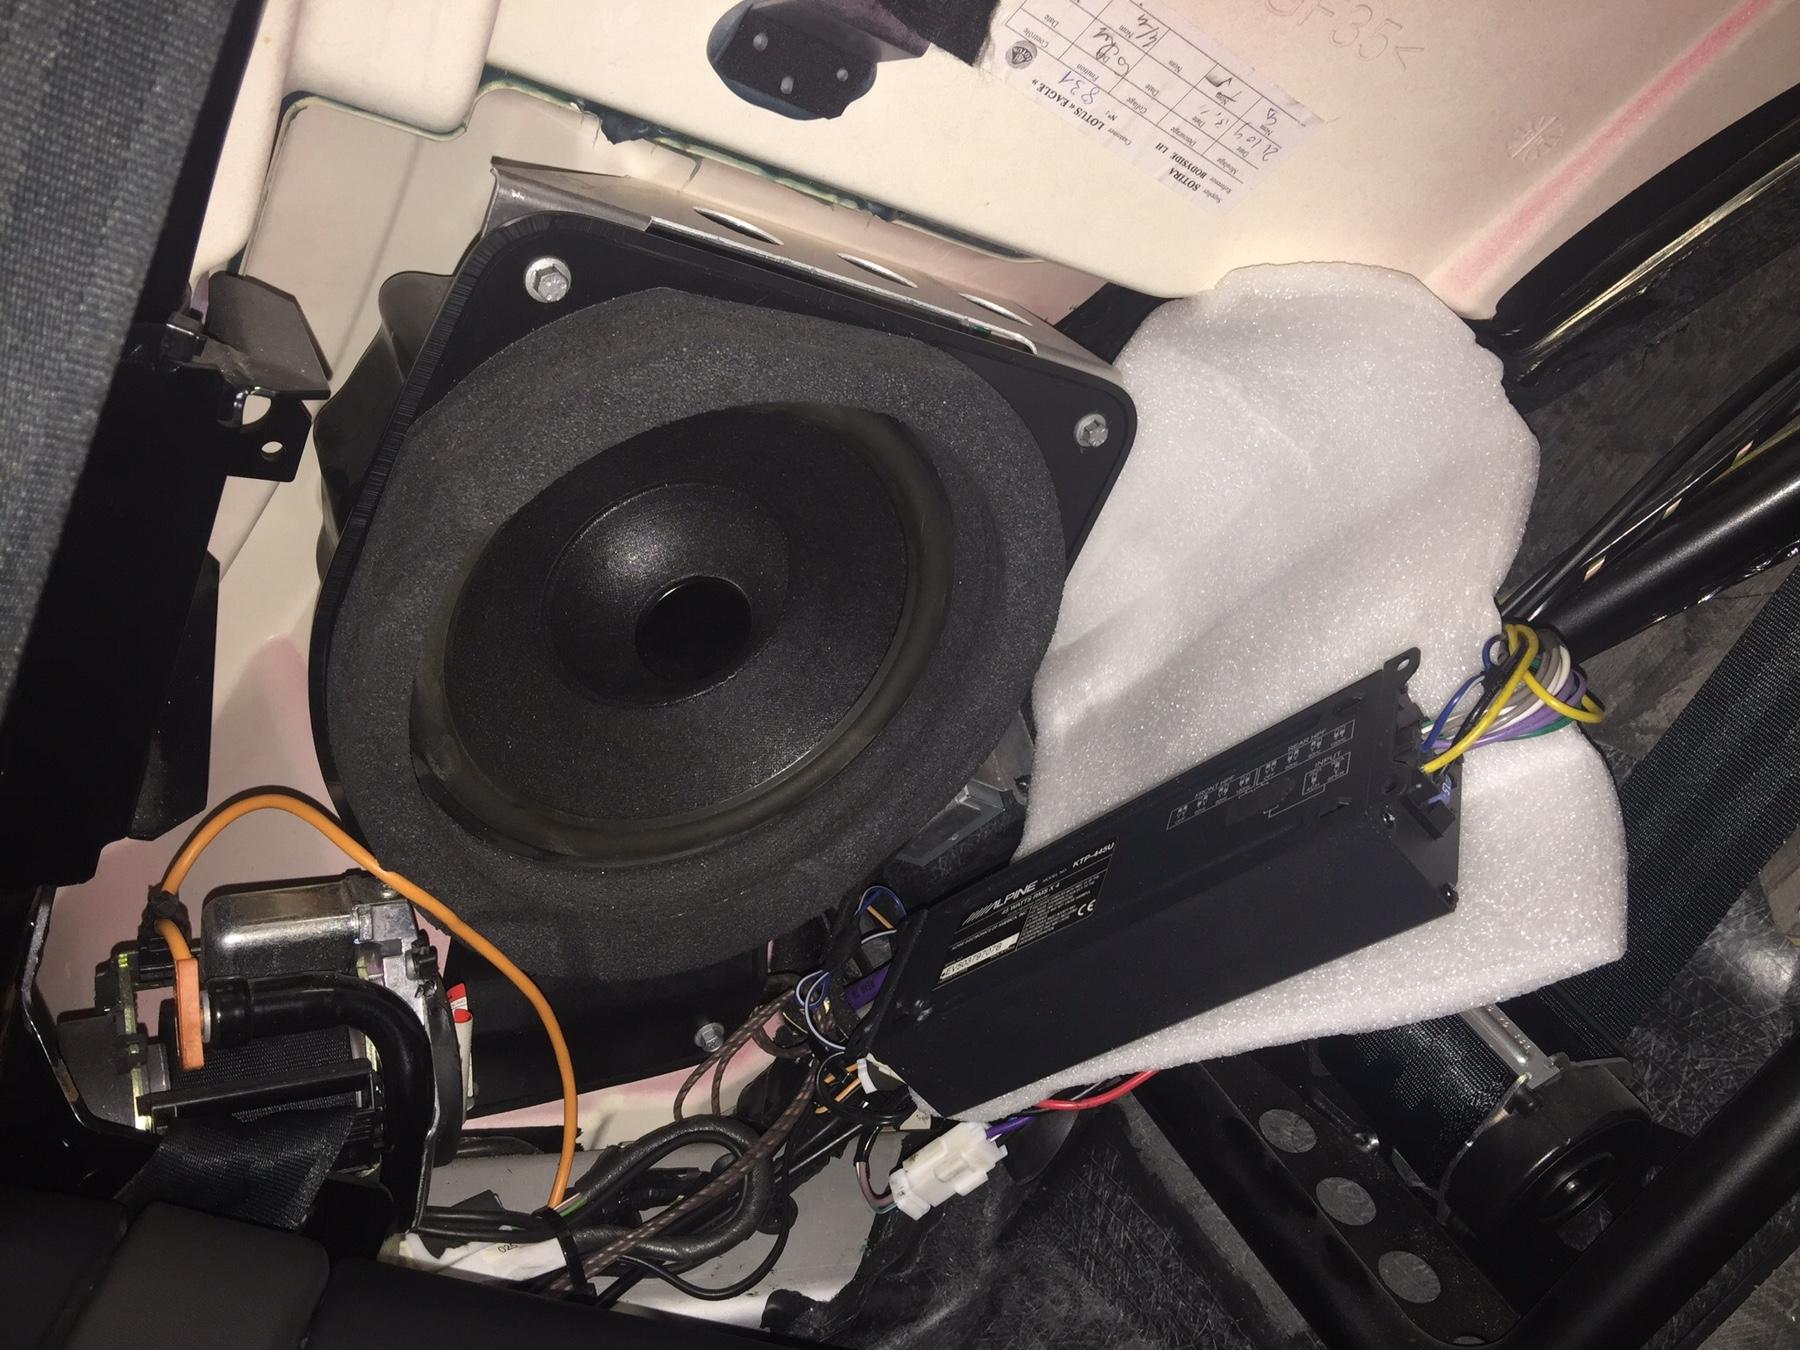 Evora Stereo System - Page 10 - Lotustalk